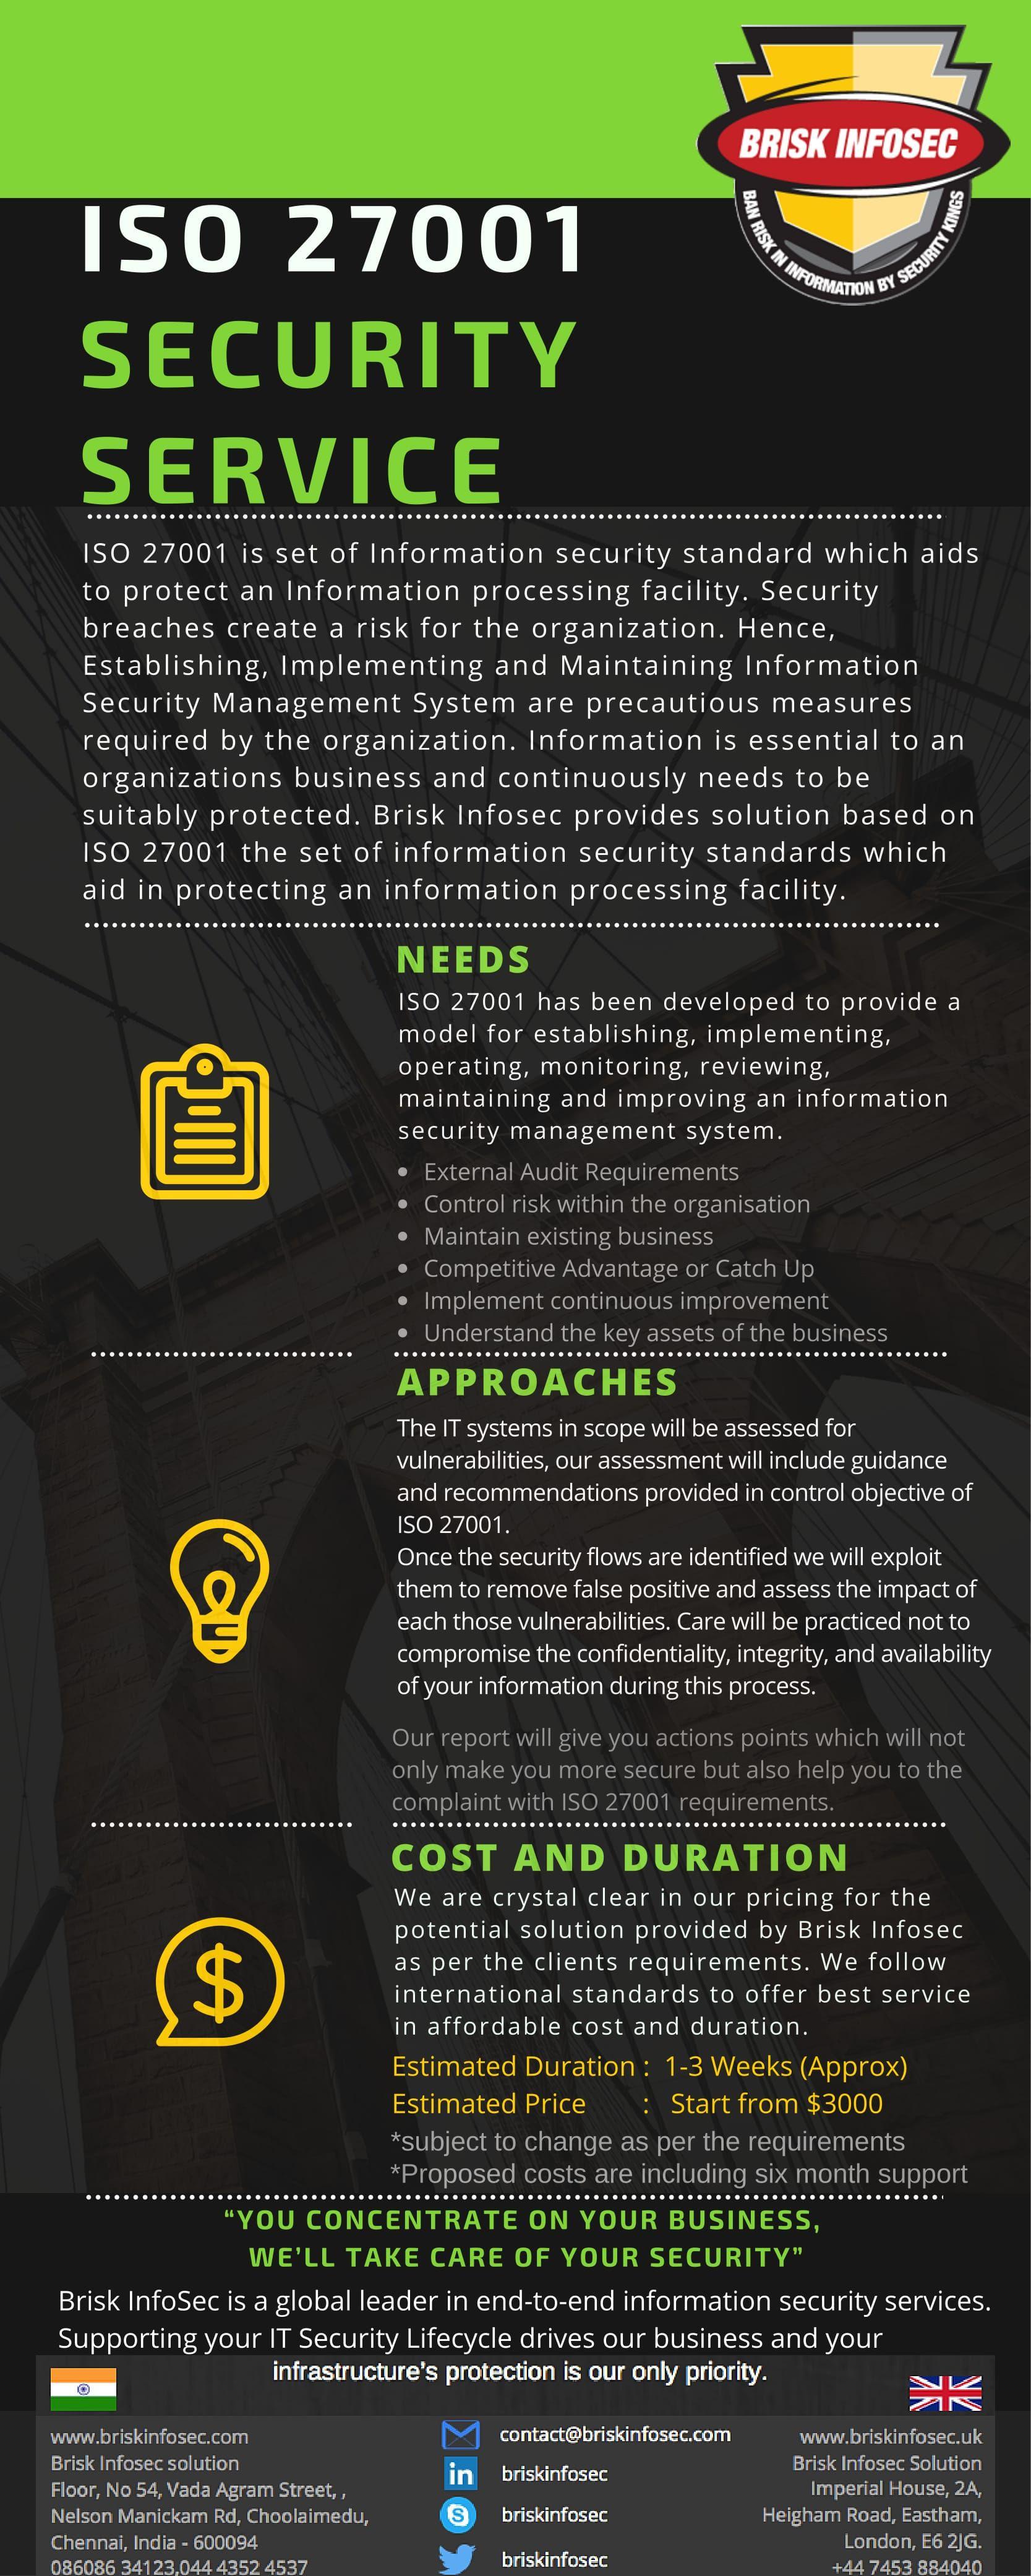 ISO Brisk Infosec Security Services Brochures